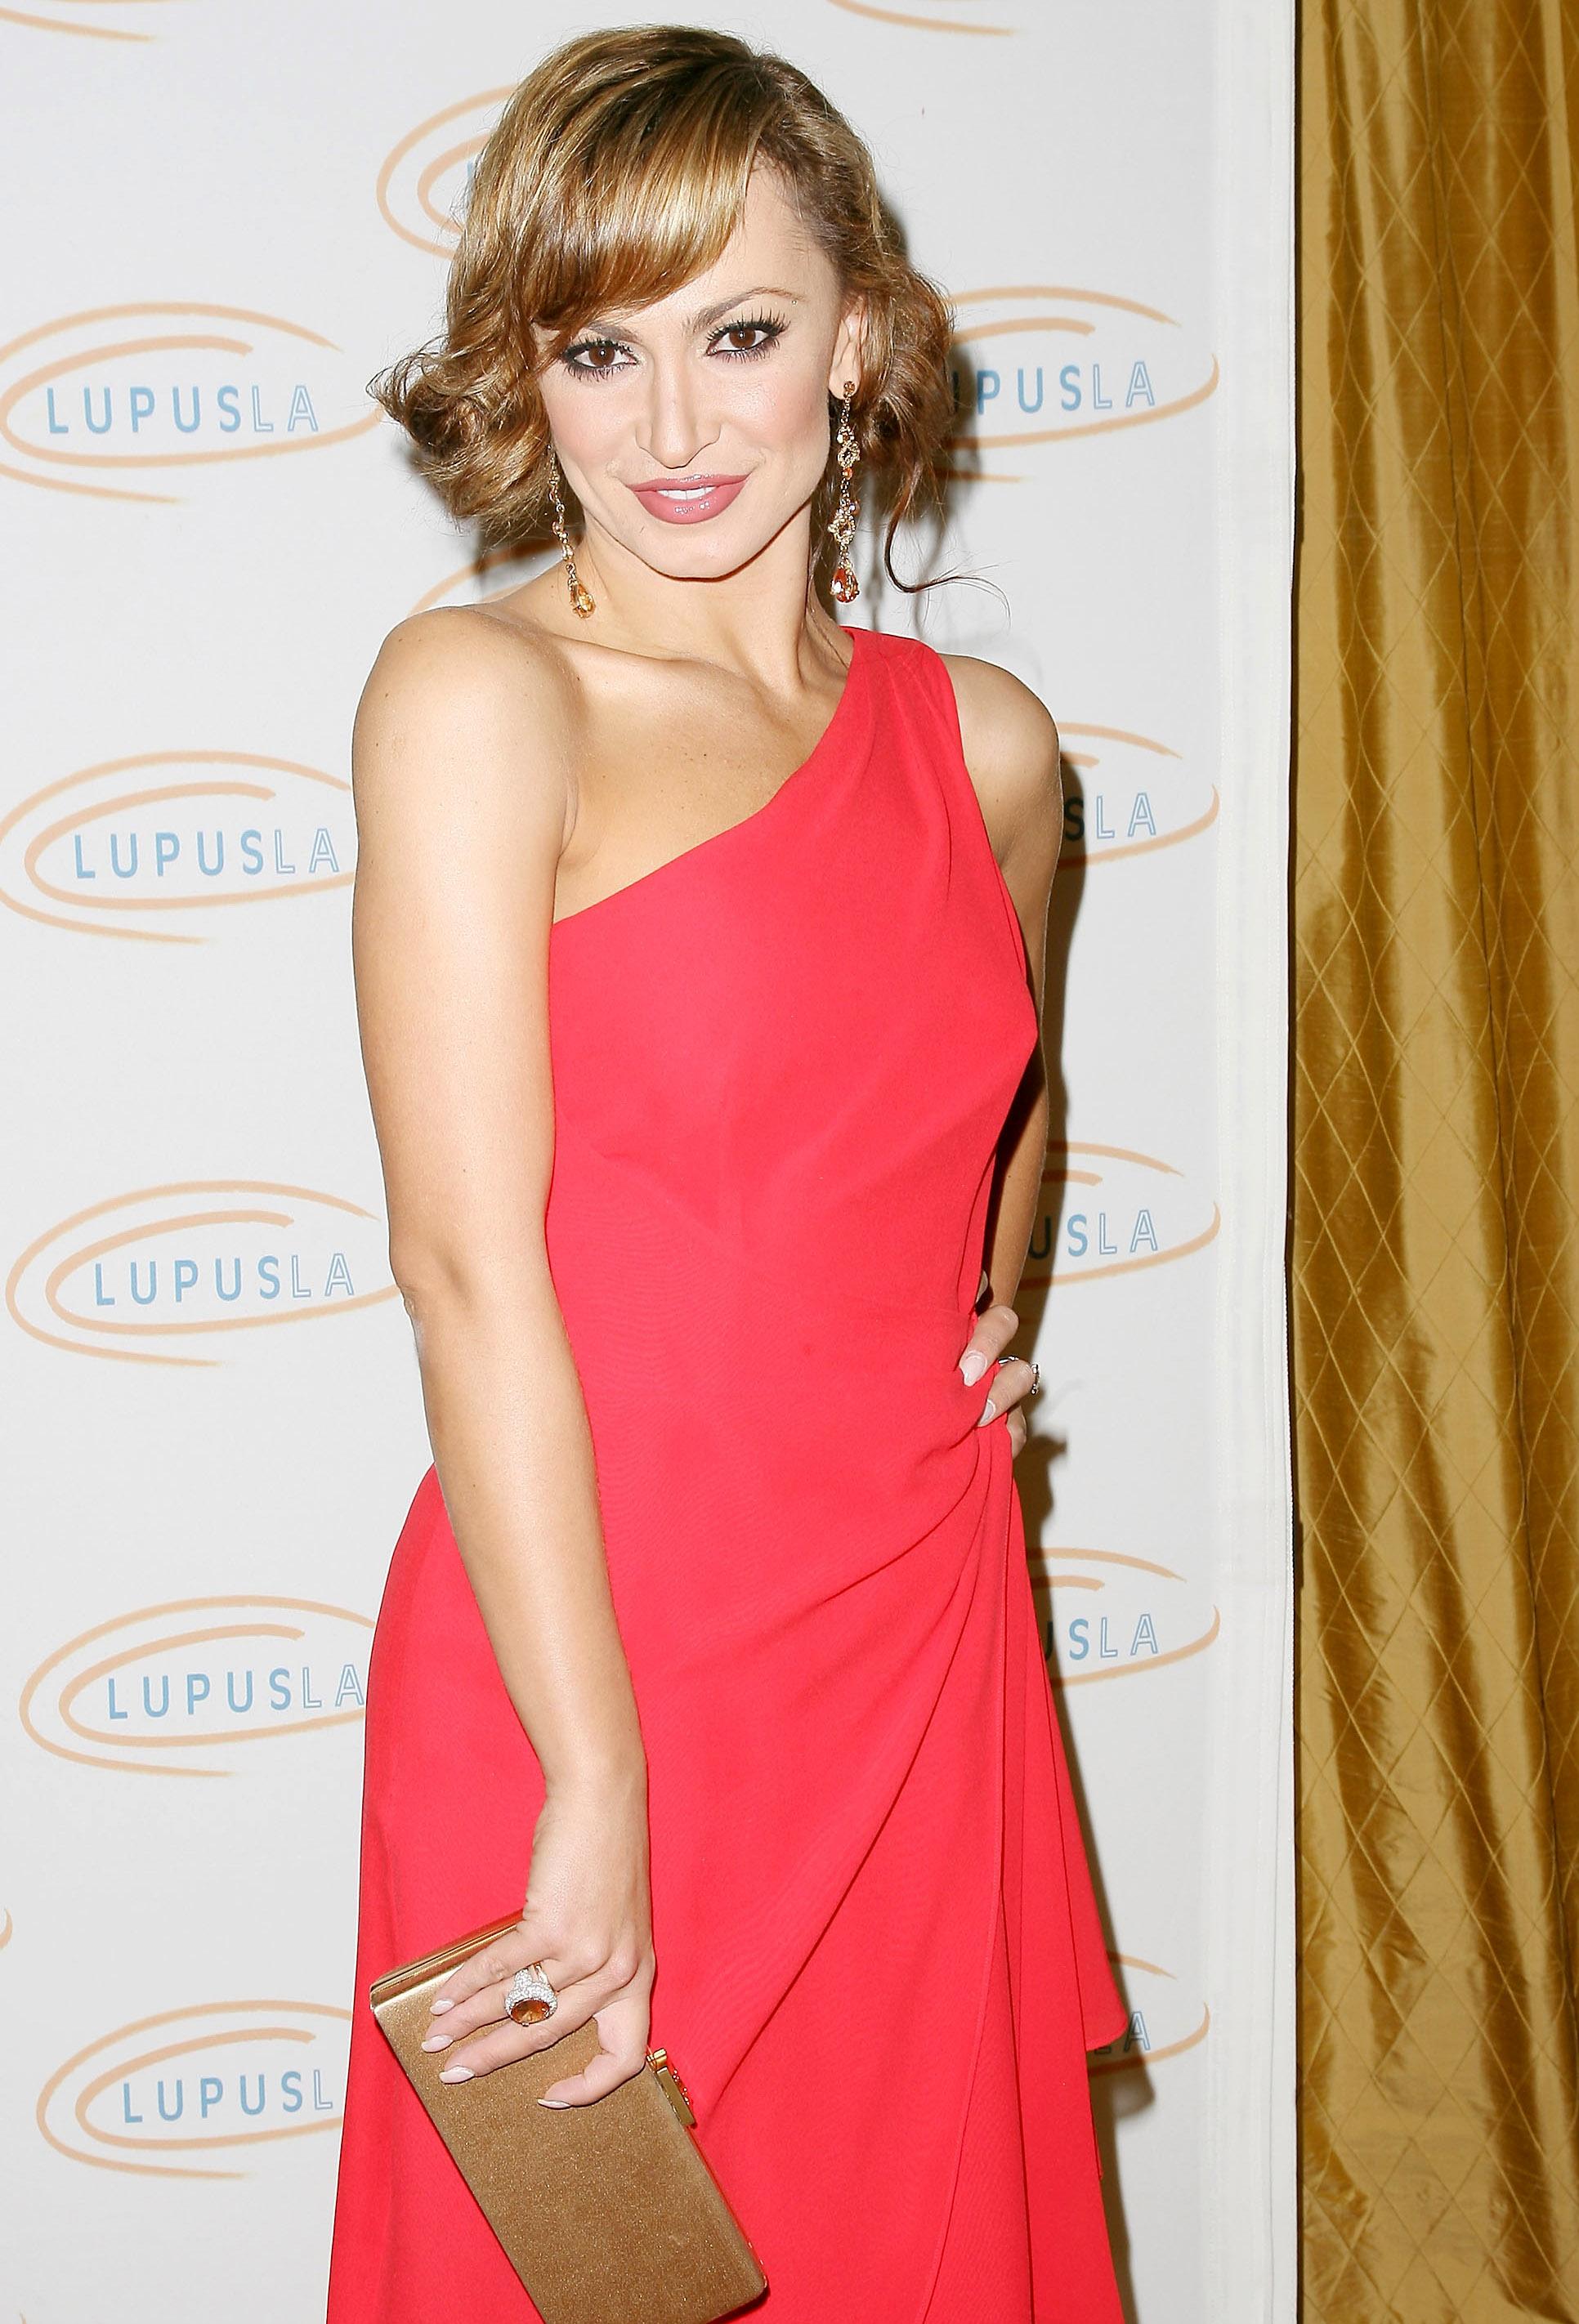 31077_Karina_Smirnoff_2008-11-07_-_Lupus_LA7s_Sixth_Annual_Hollywood_Bag_Ladies_Luncheon_in_Beverly_H_2219_122_802lo.jpg